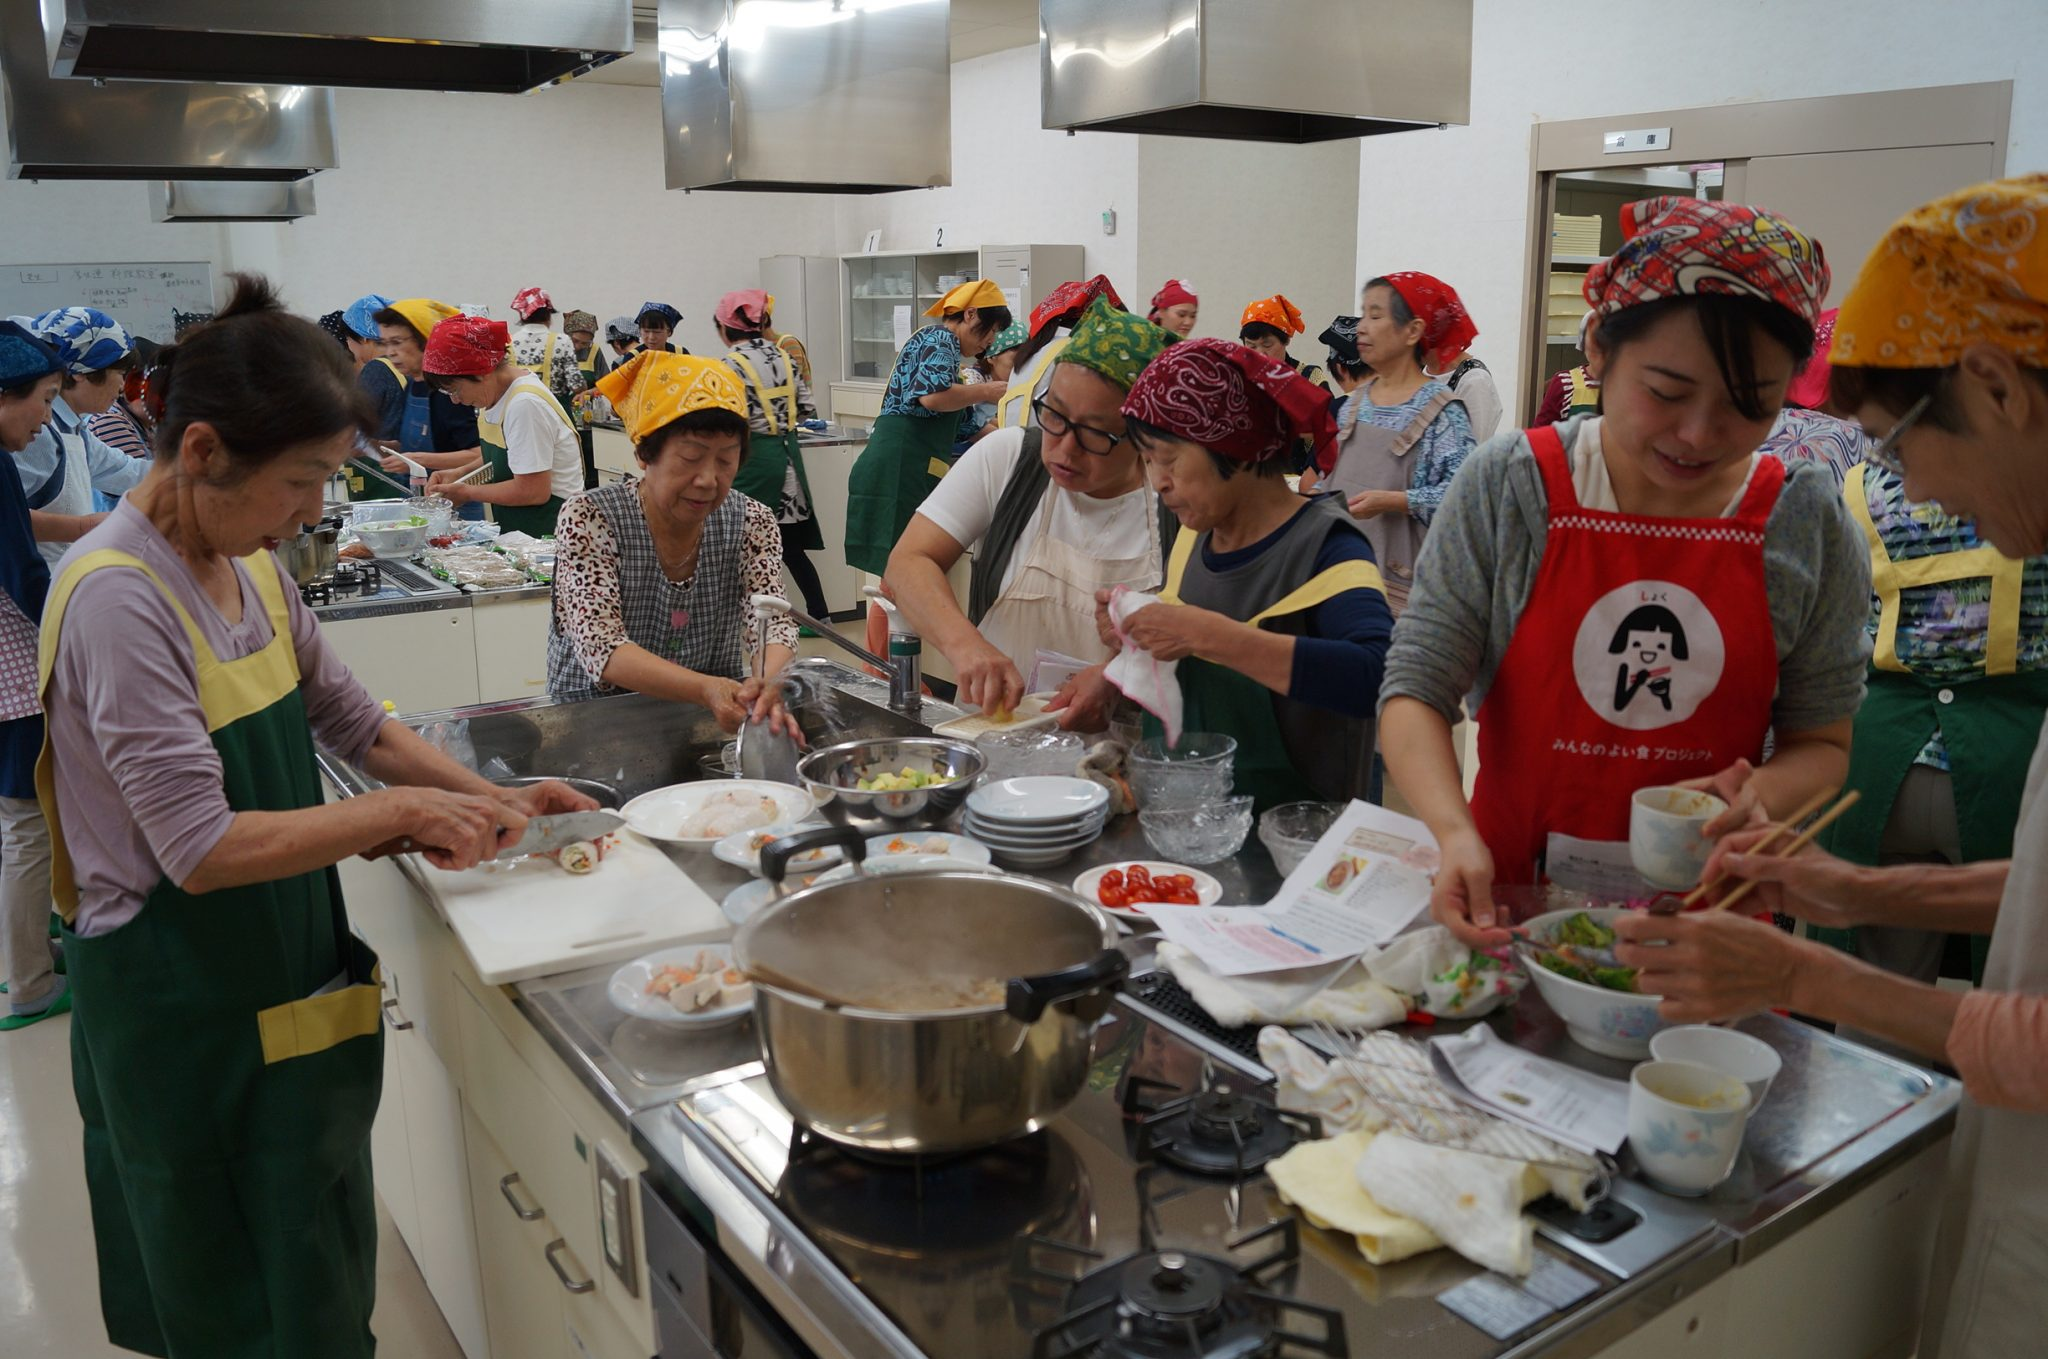 JA 海部東農業協同組合(あまひがし) -減塩料理で健康維持を